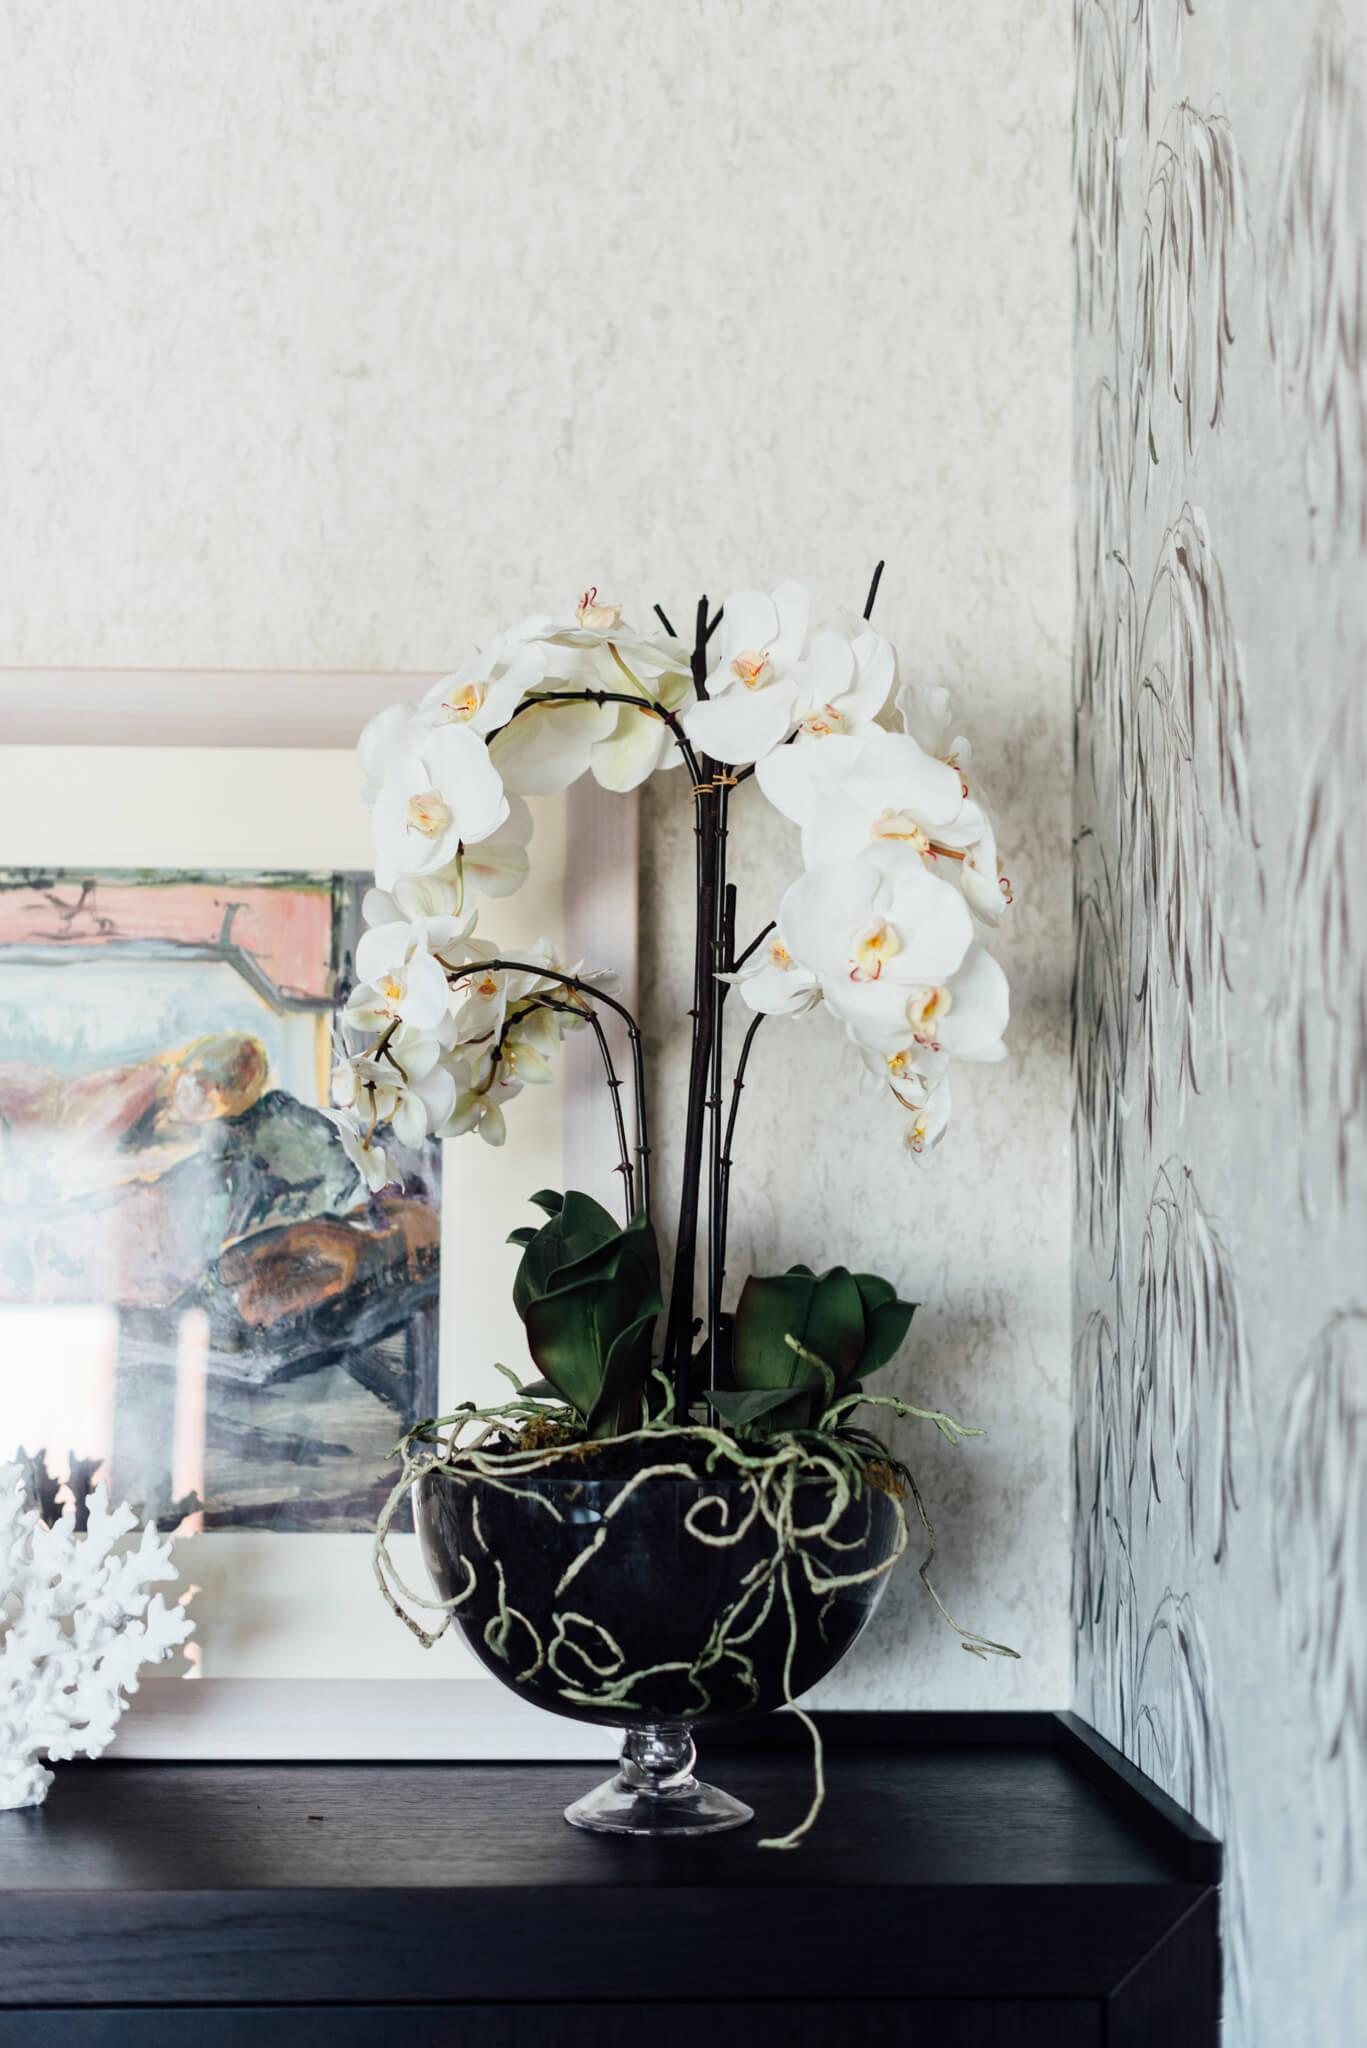 chelsea_mclaine-interior_hamilton-ryanjohnstonco-31